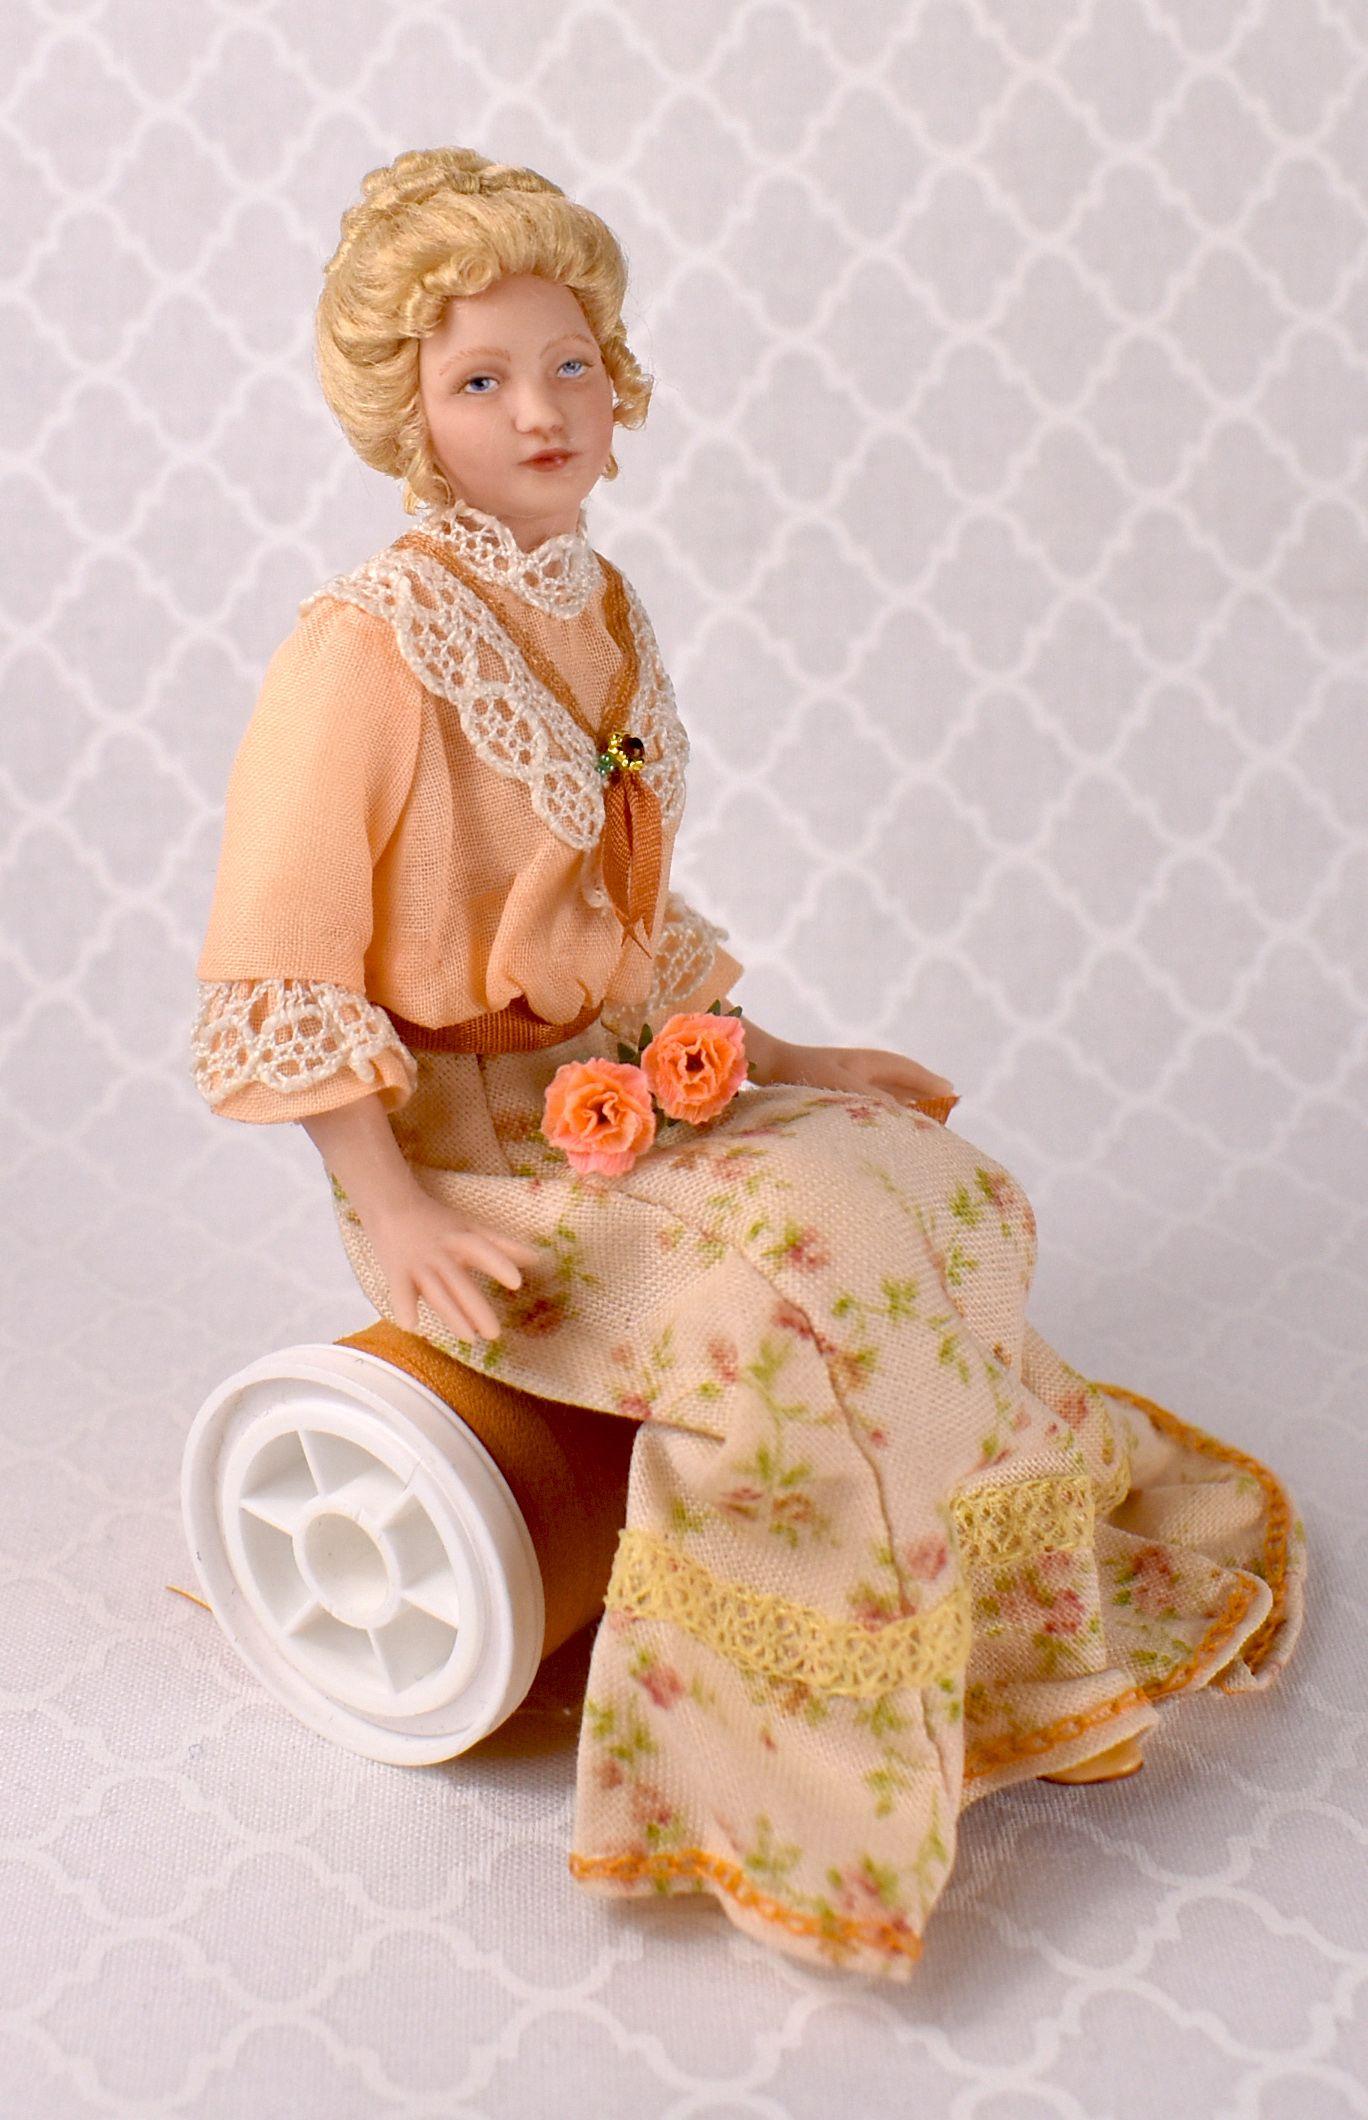 A Lovely Edwardian Lady In 1 12 Scale Dollhouse Dolls Barbie Miniatures Miniature Dolls